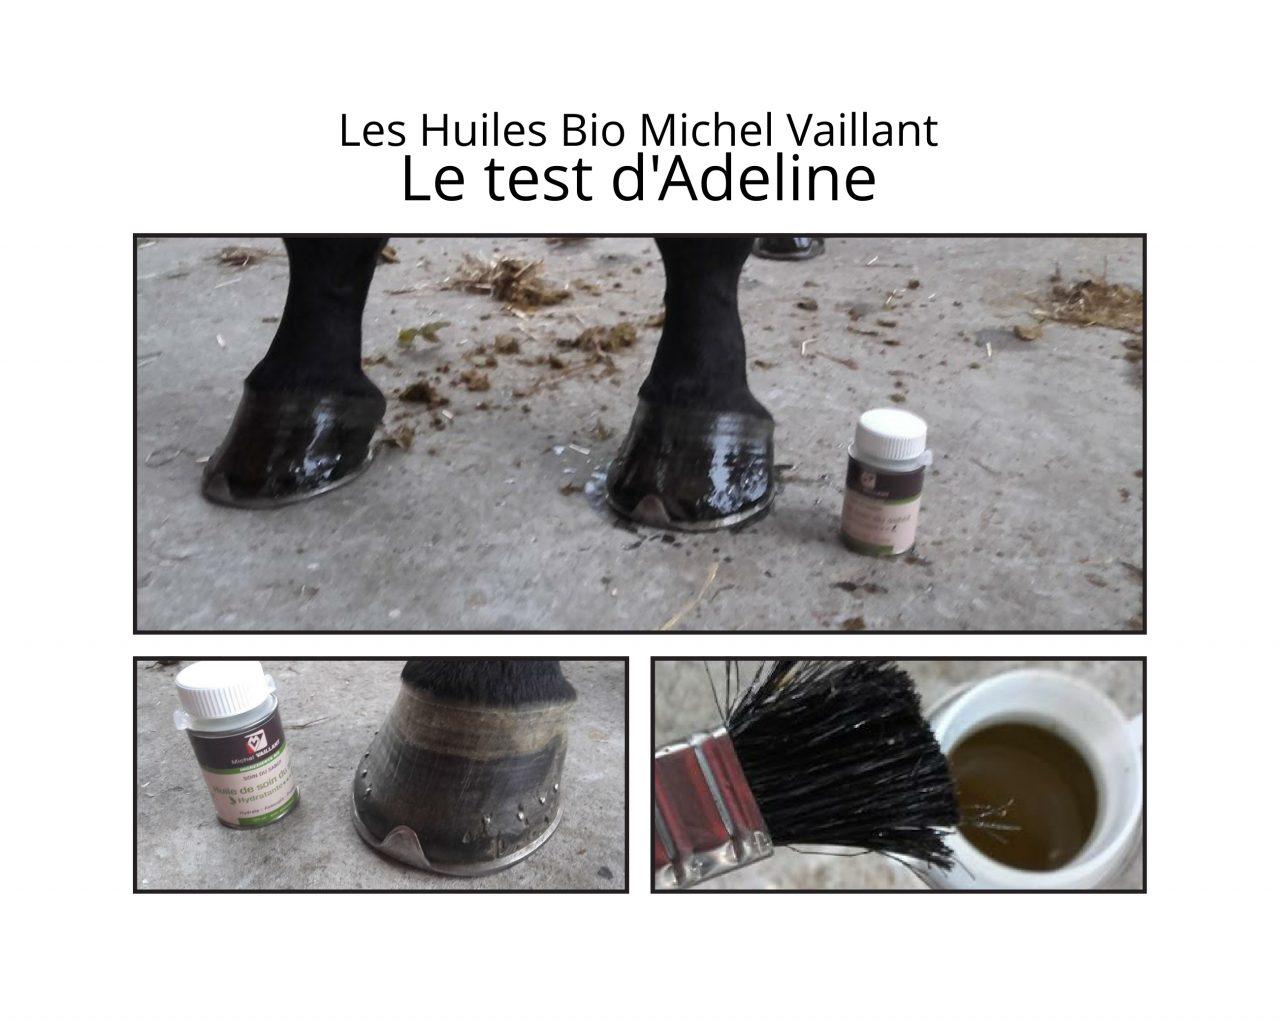 Huiles Bio Michel Vaillant